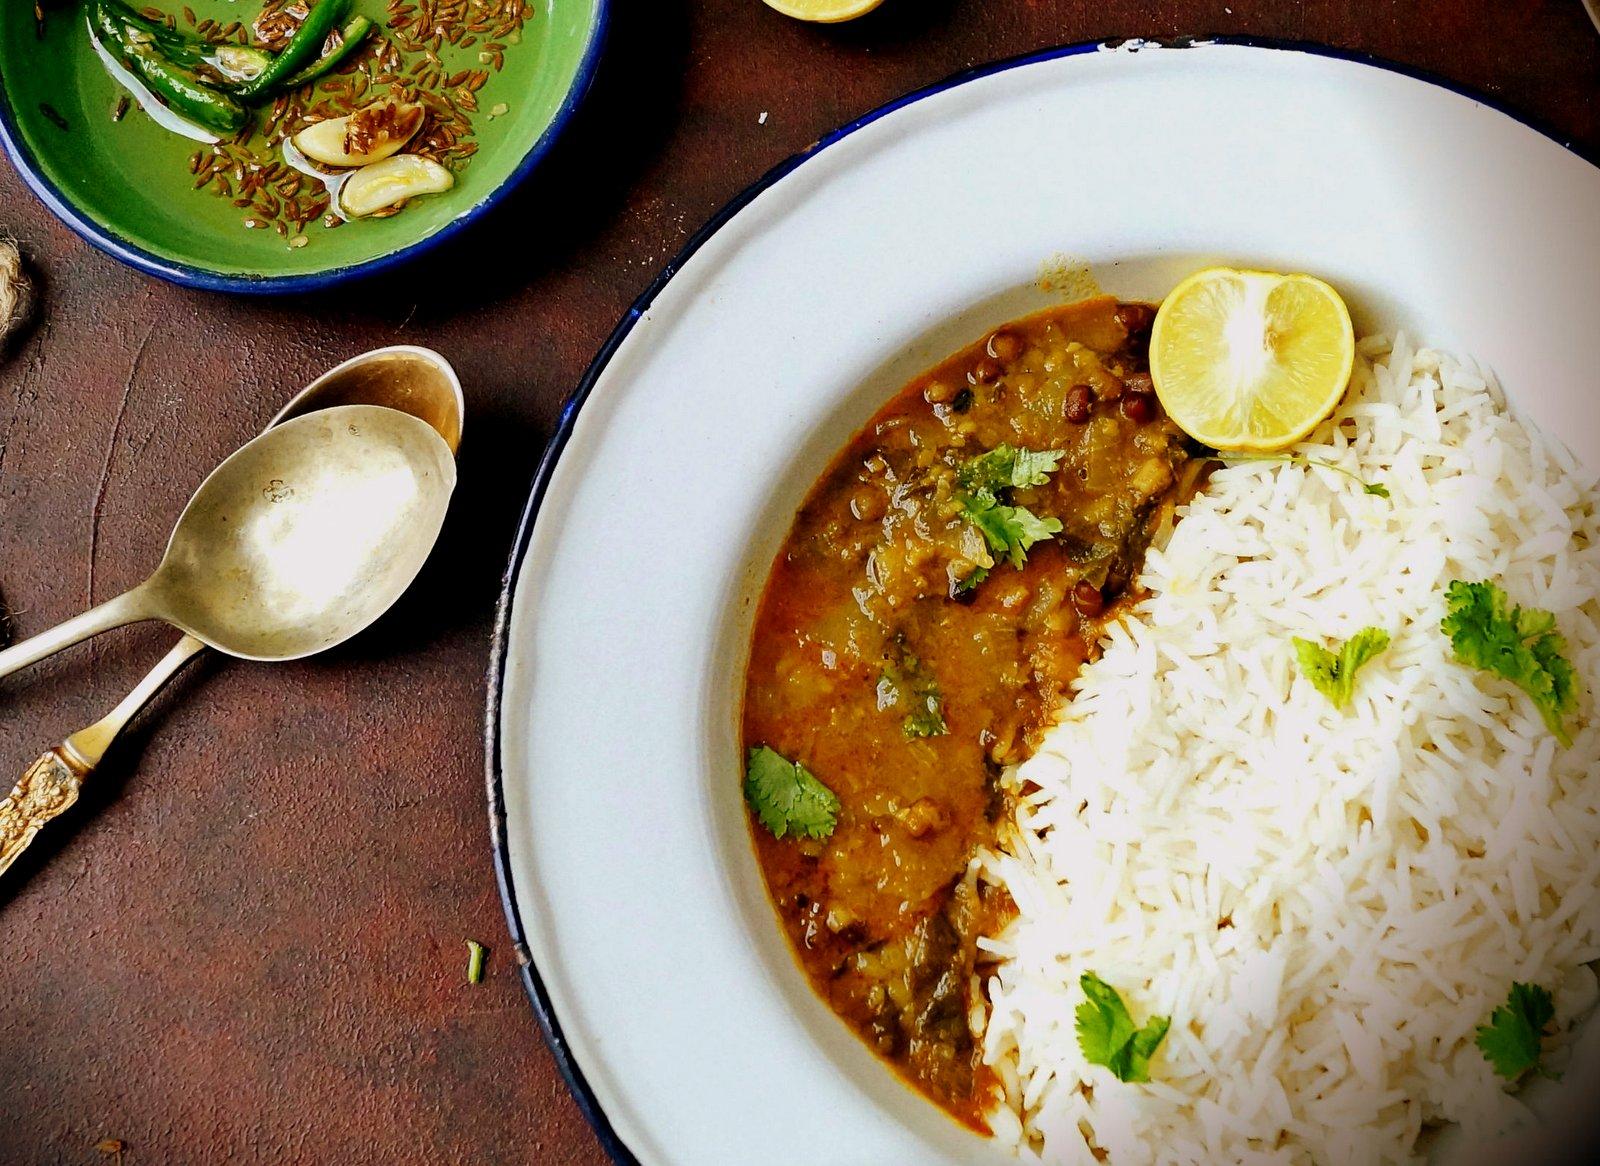 Uttar pradesh style satpaita dal recipe by archanas kitchen uttar pradesh style satpaita dal recipe forumfinder Images